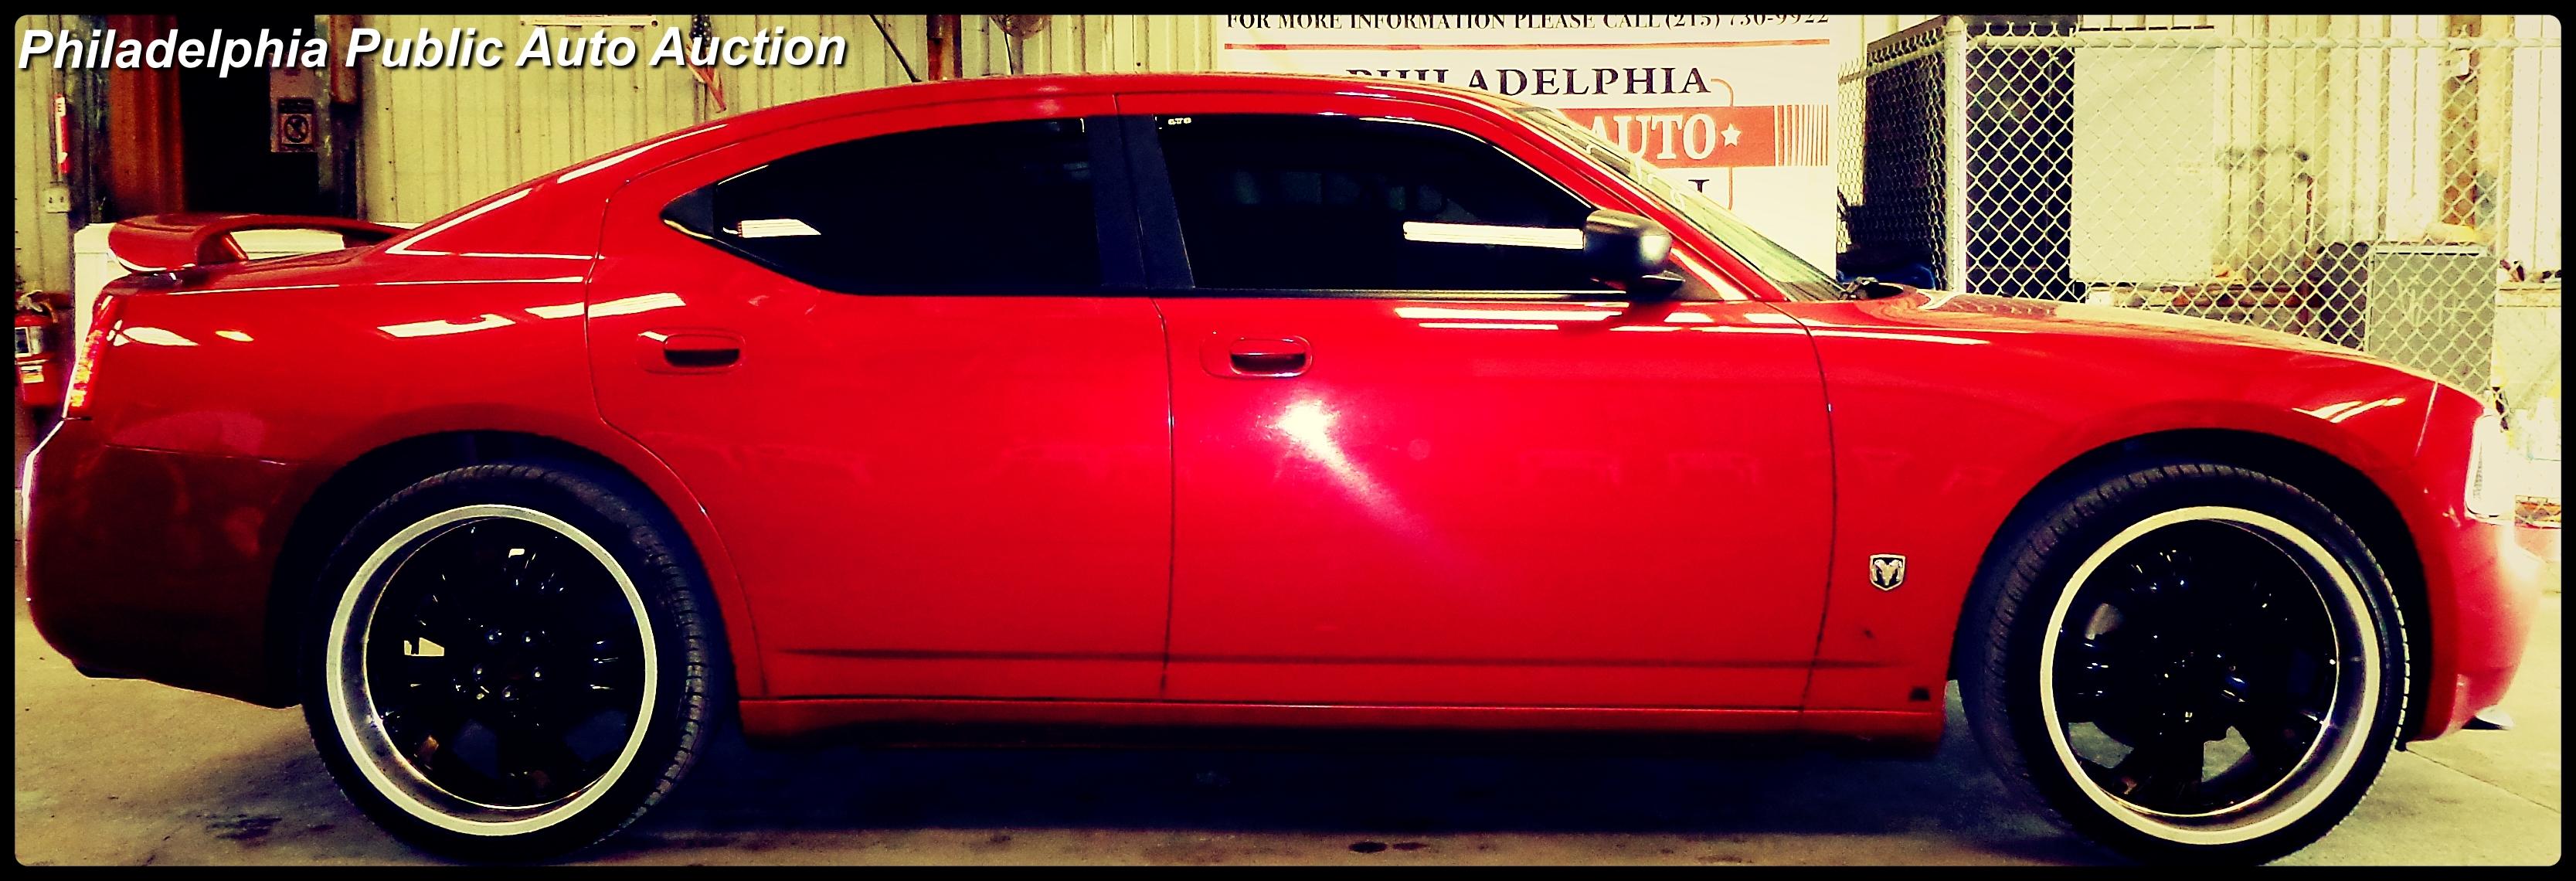 Philadelphia Auto Auction >> Philadelphia Public Auto Auction 5618 Woodland Ave 42 Philadelphia